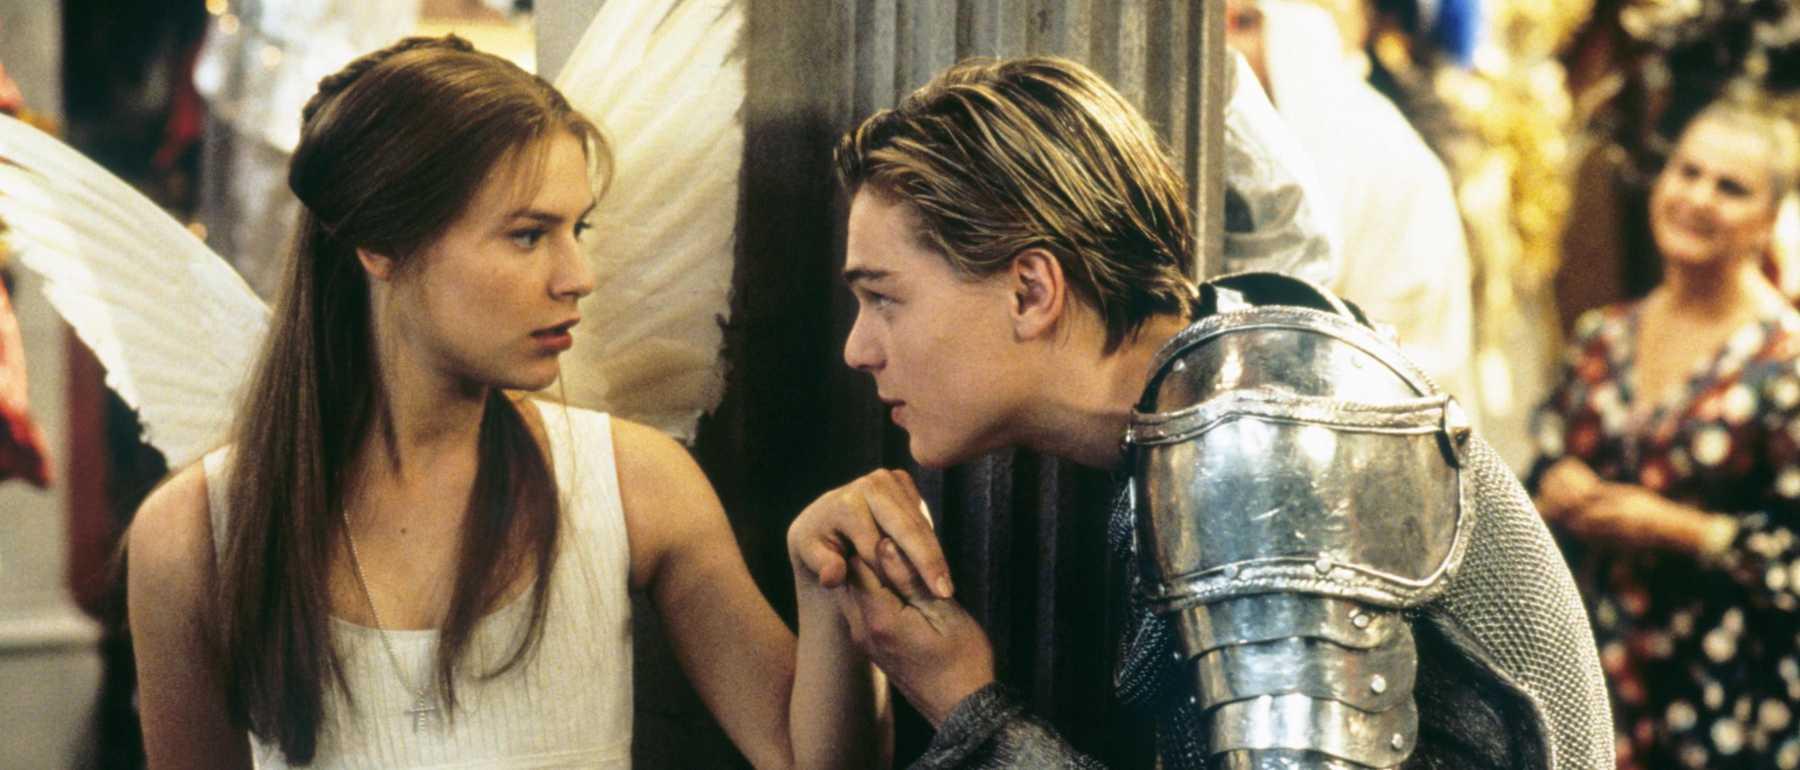 Fox To Develop Latin Romeo And Juliet Drama | romeo and Juliet